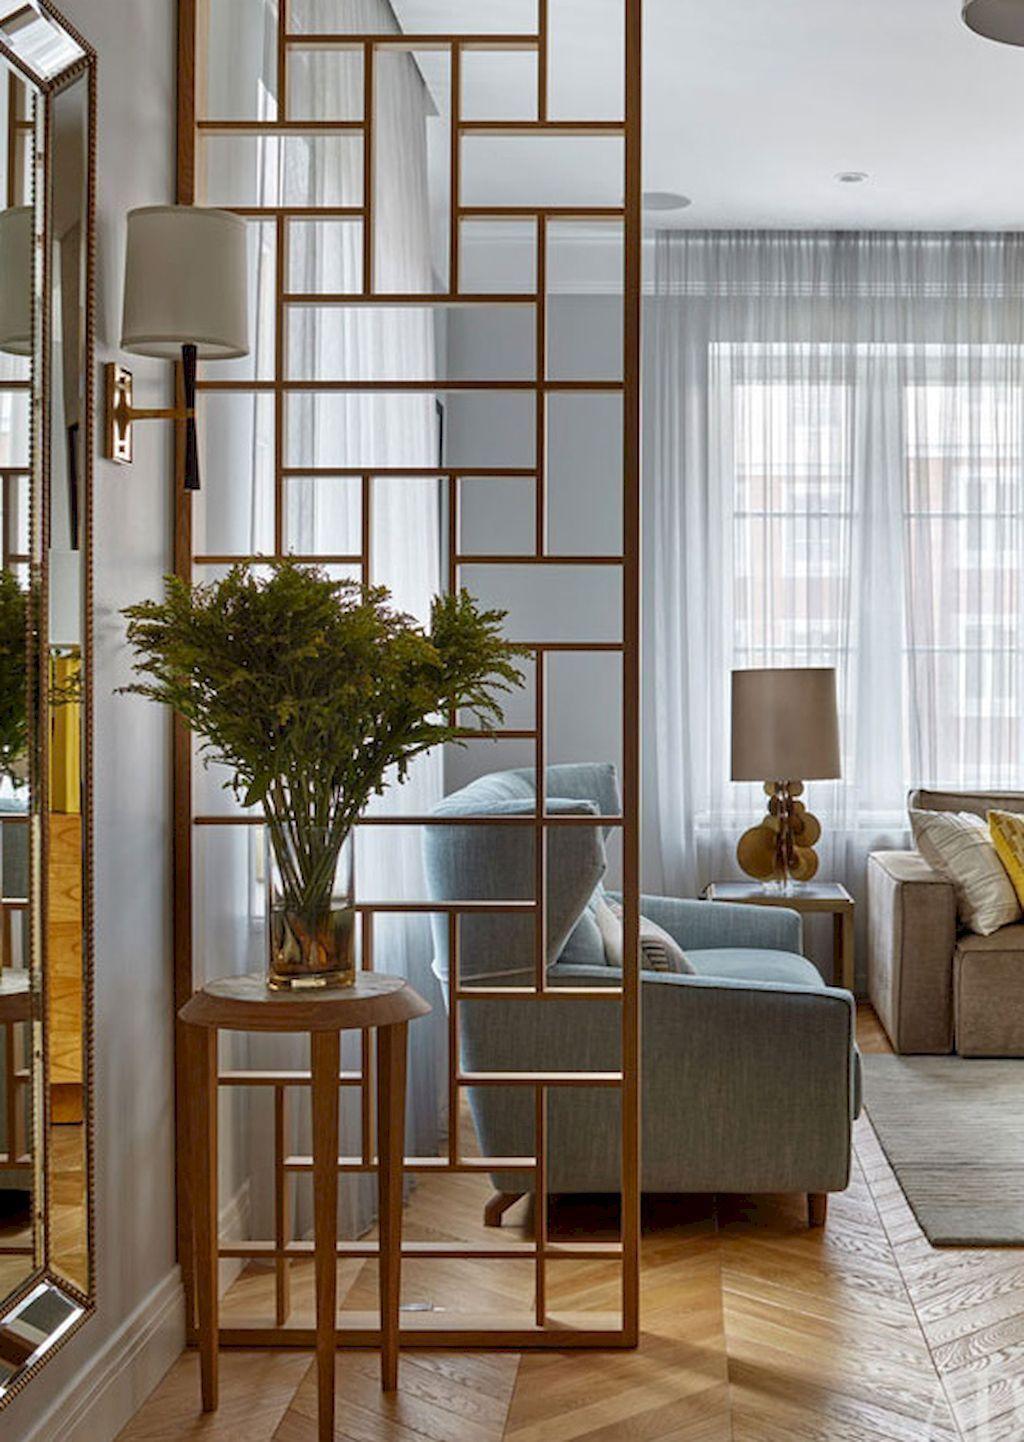 Gorgeous 60 Mid Century Modern Living Room Furniture Ideas #interiordesign  #interiordecoration 35+ Most